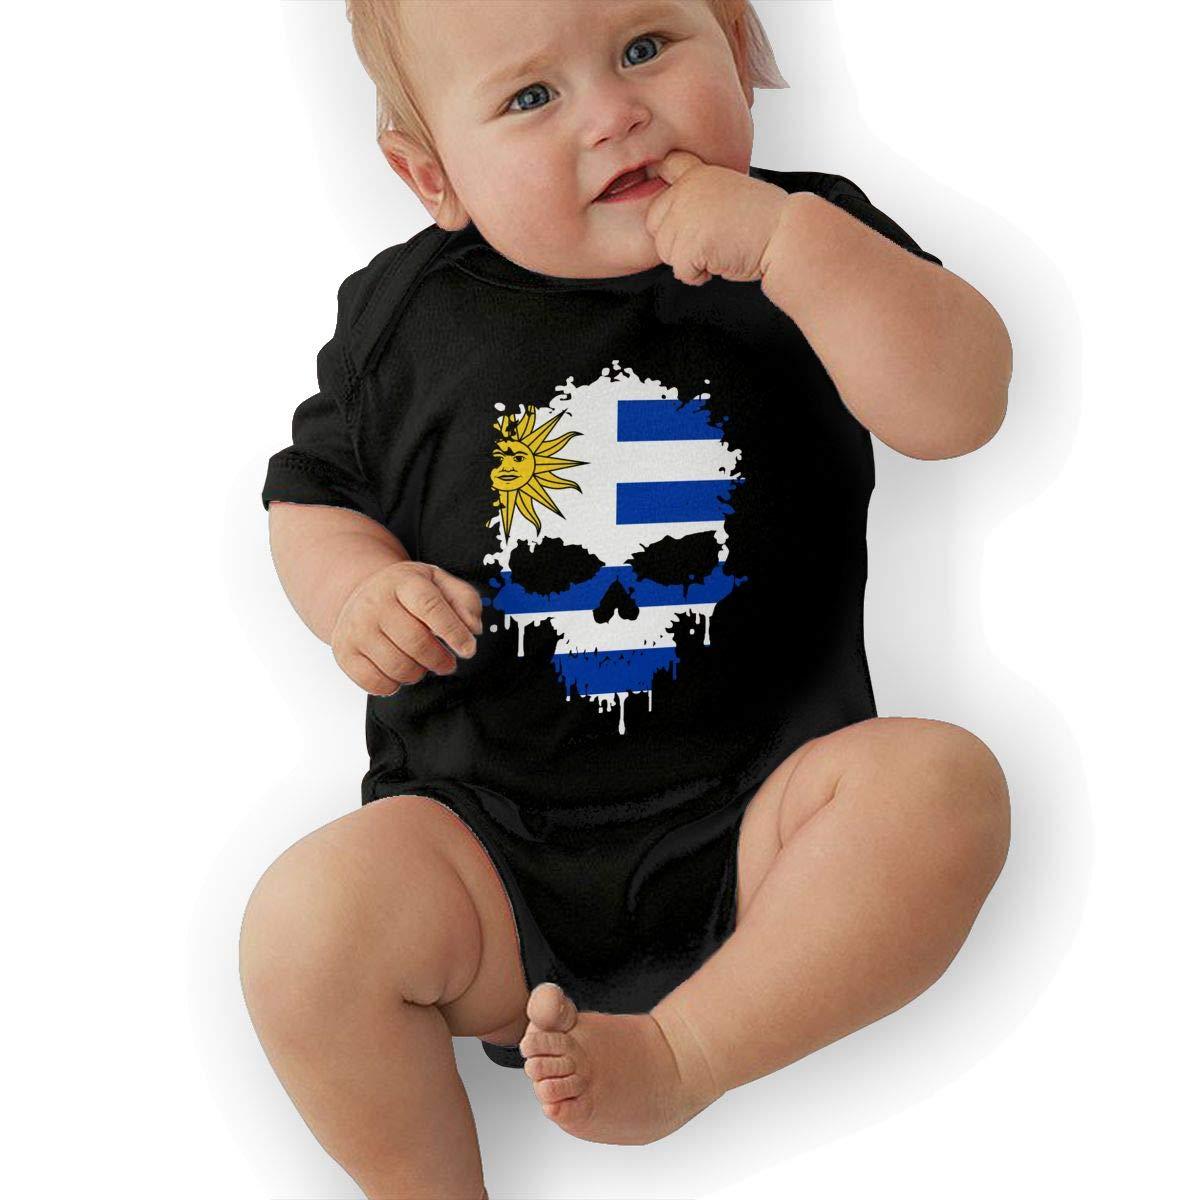 Fashion Uruguay Skull Crawler U88oi-8 Short Sleeve Cotton Rompers for Baby Girls Boys